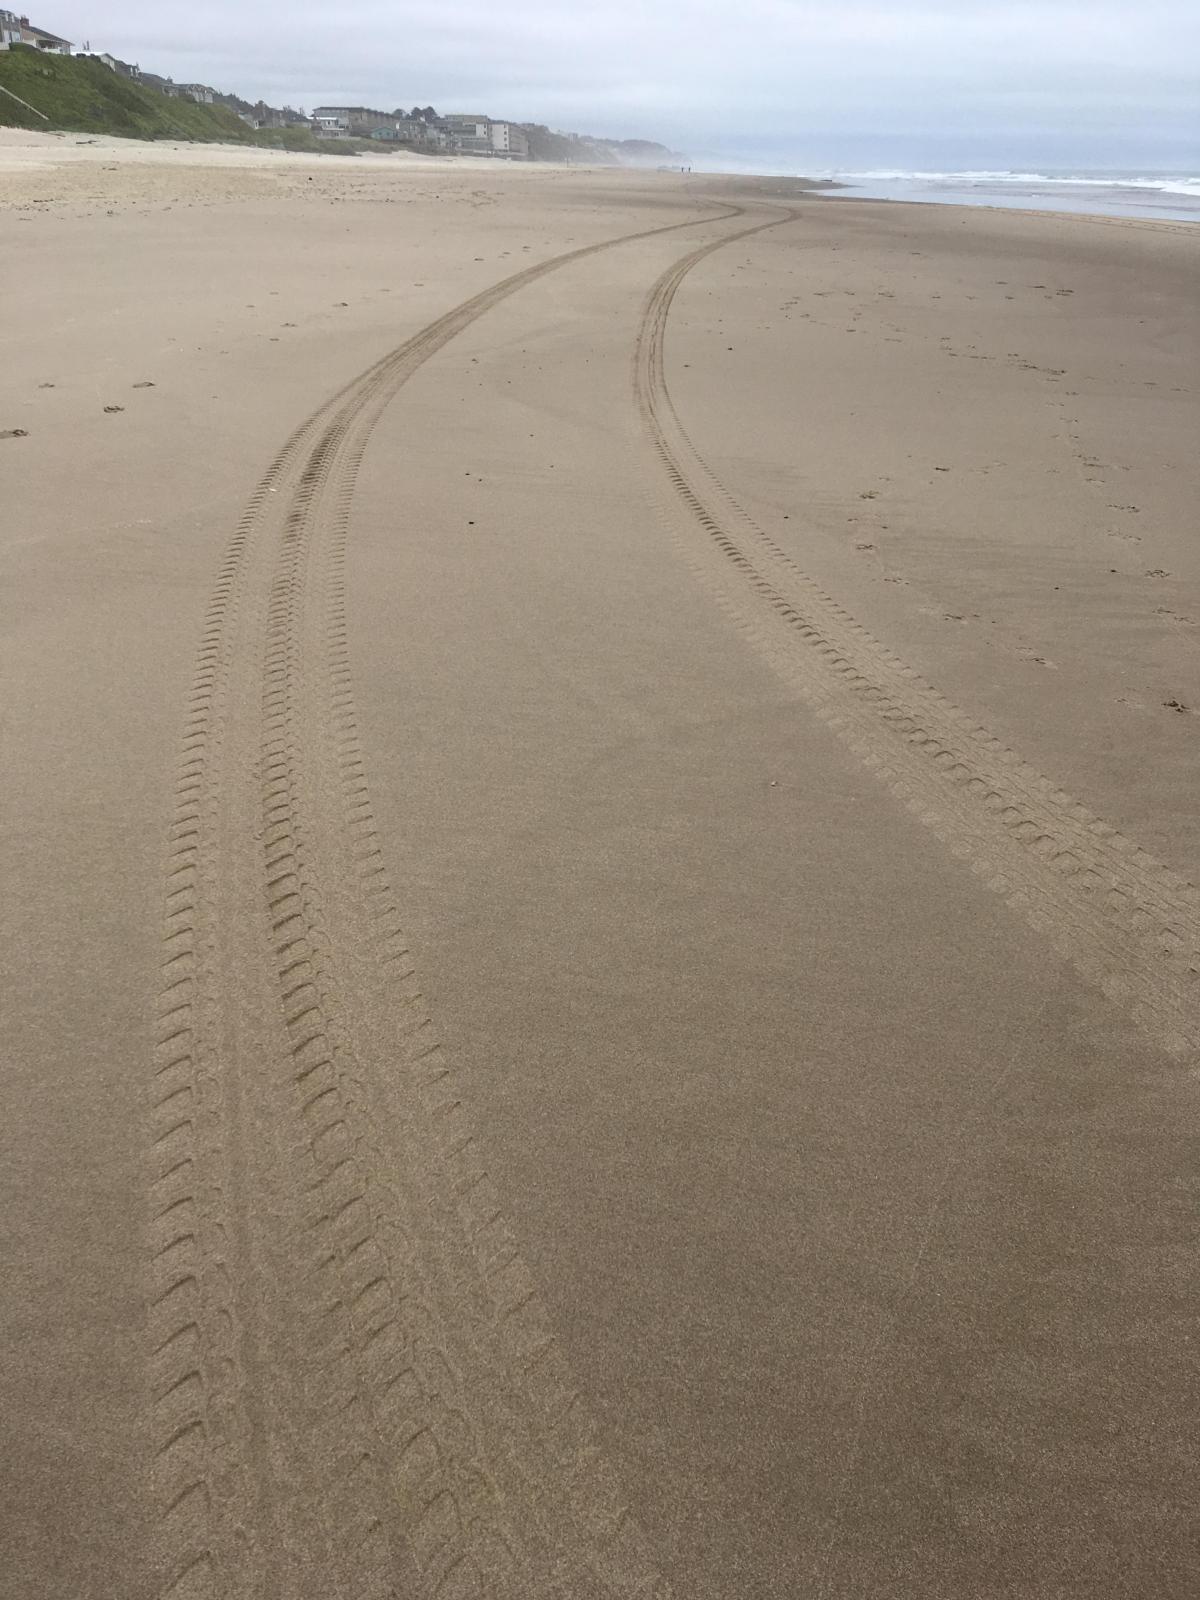 Car tracks on shoreline